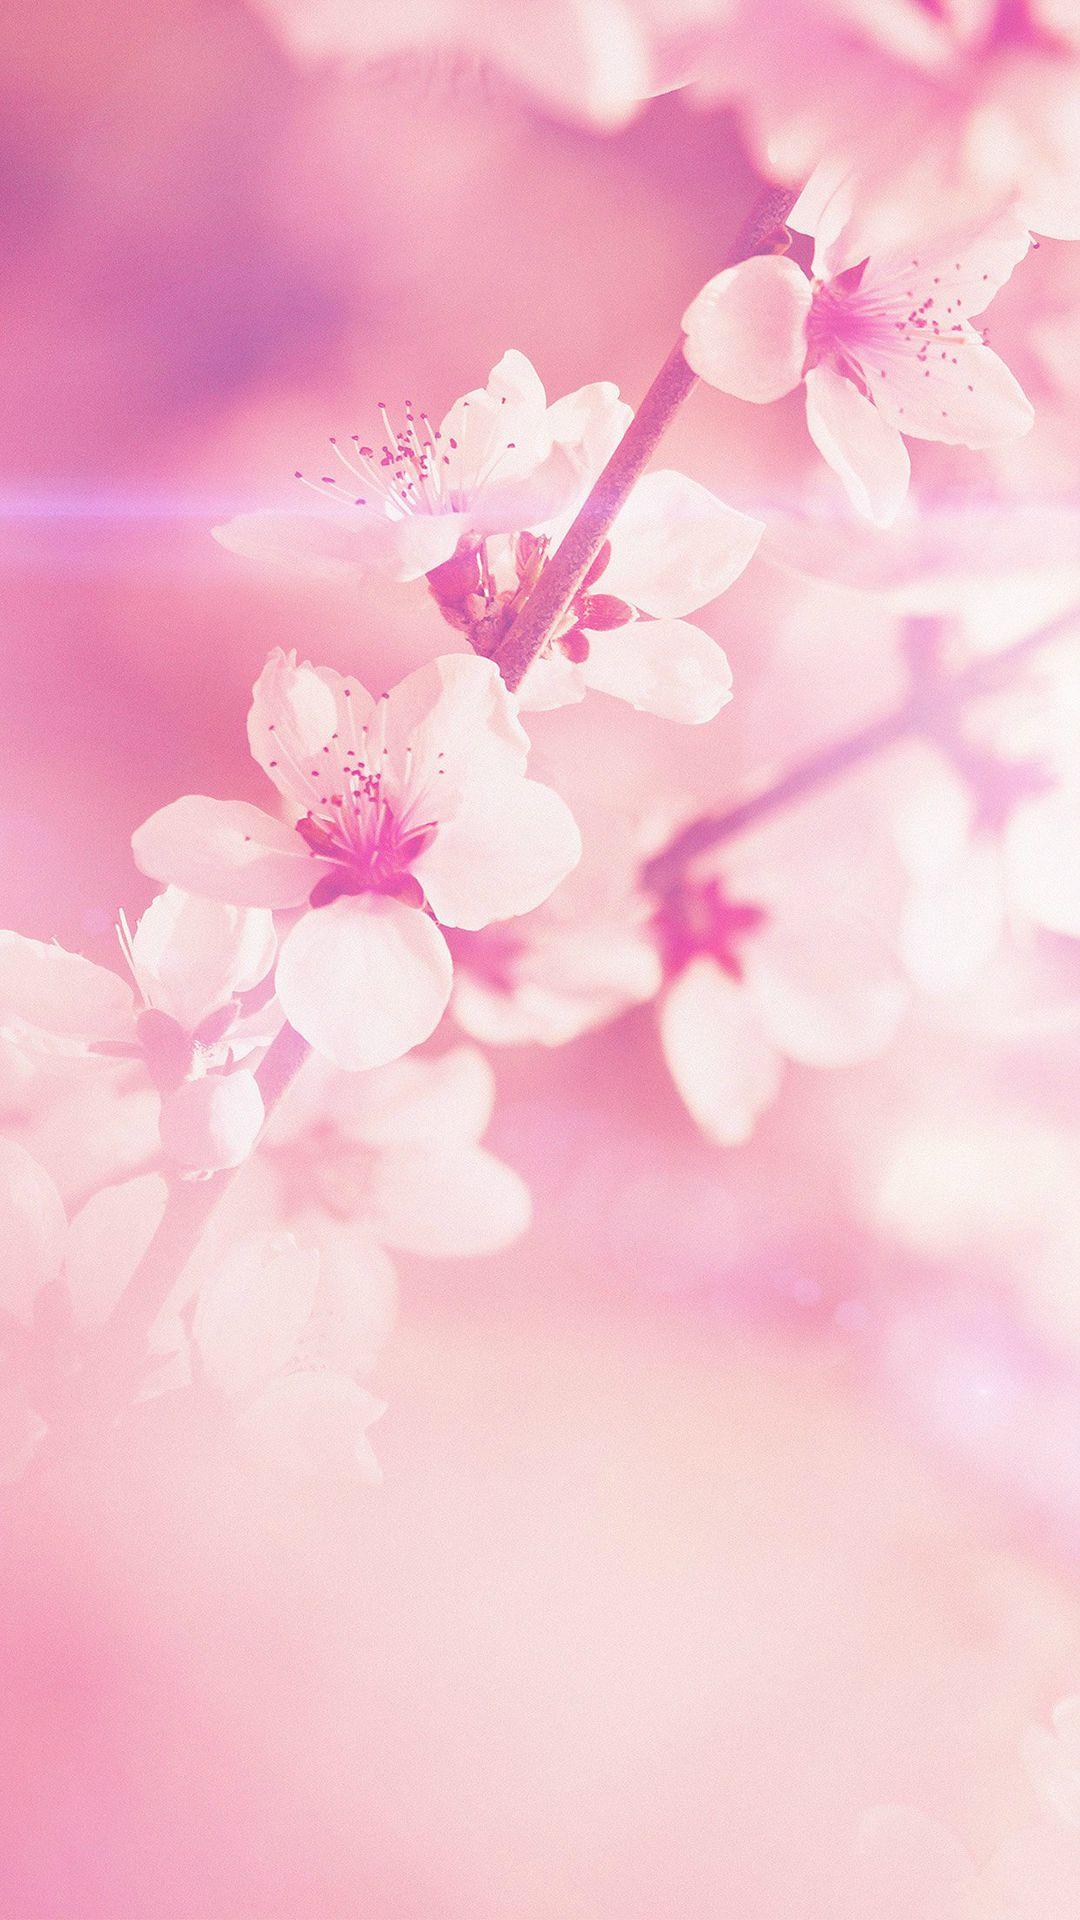 Spring wallpaper iPhone 5